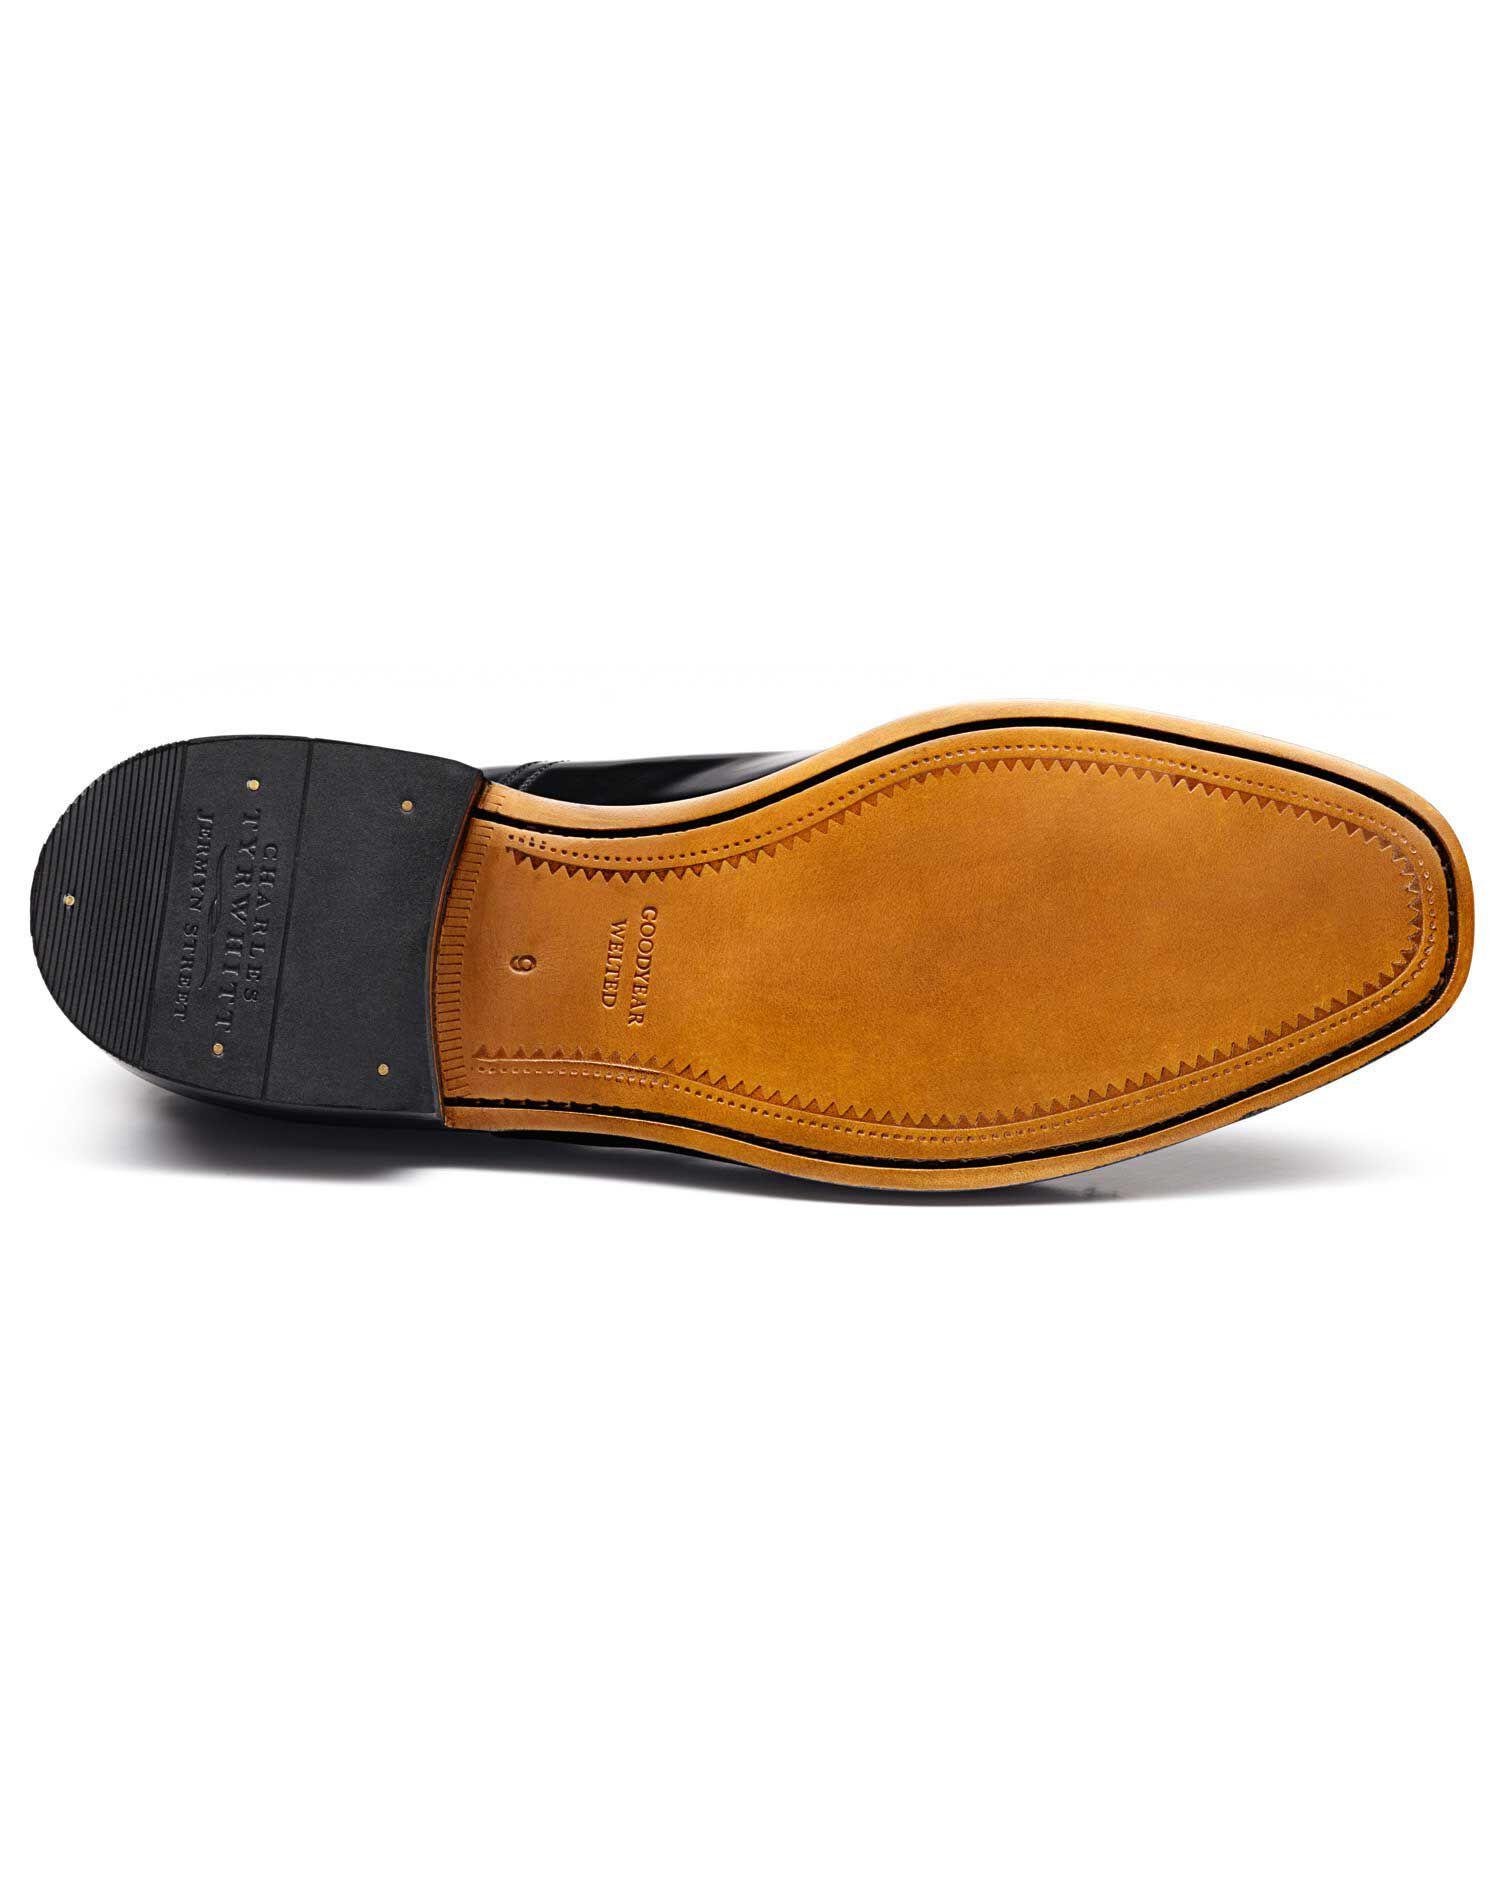 Chaussures Oxford Noires Goodyear À Cousu BCoQrthdsx